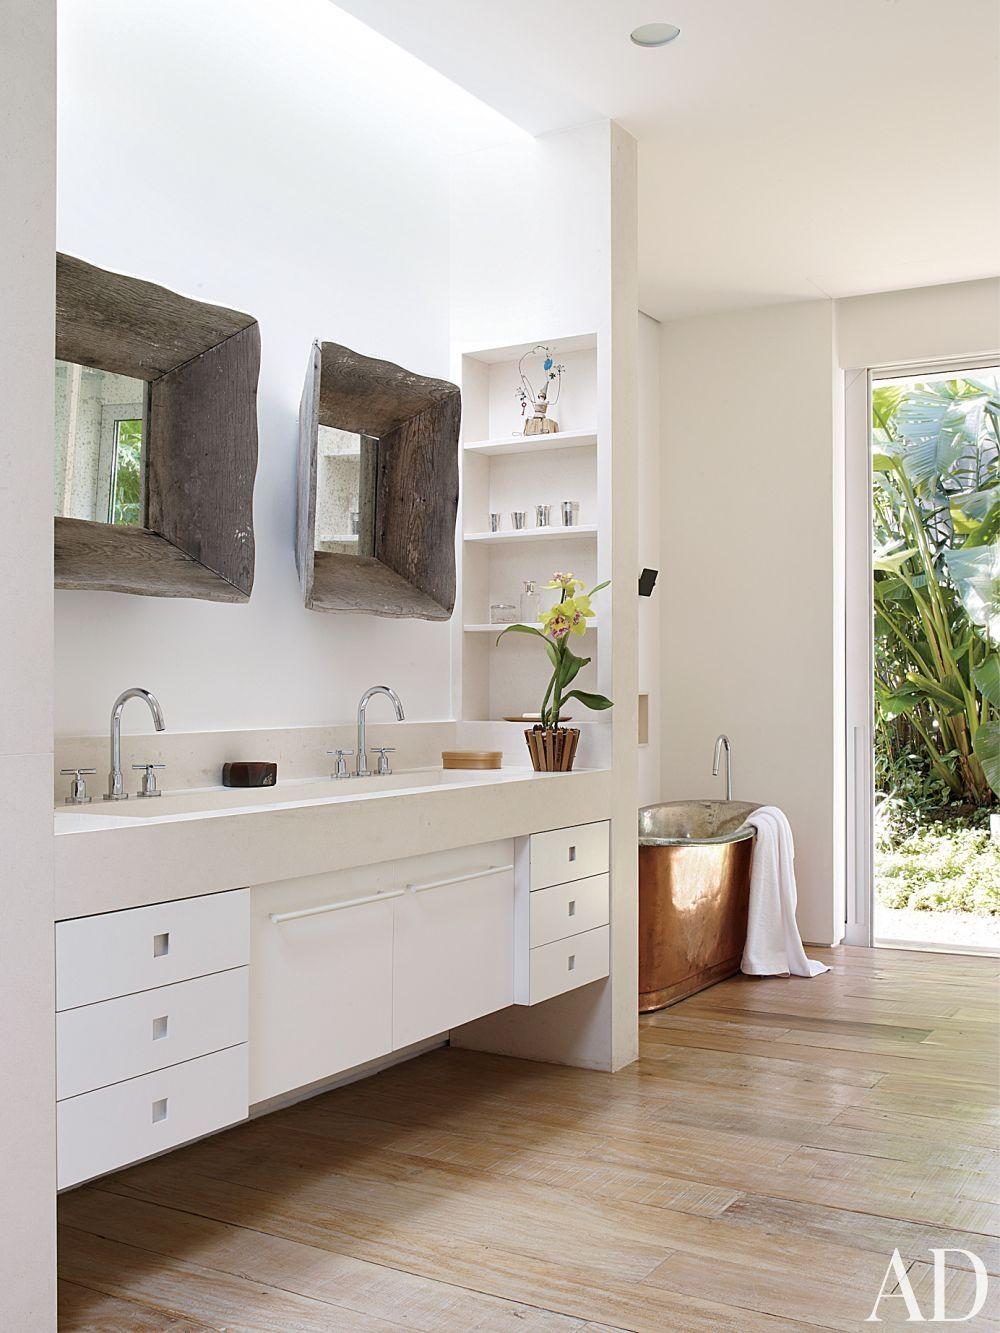 Rustic Bathroom by Isay Weinfeld in São Paulo, Brazil   House ideas ...